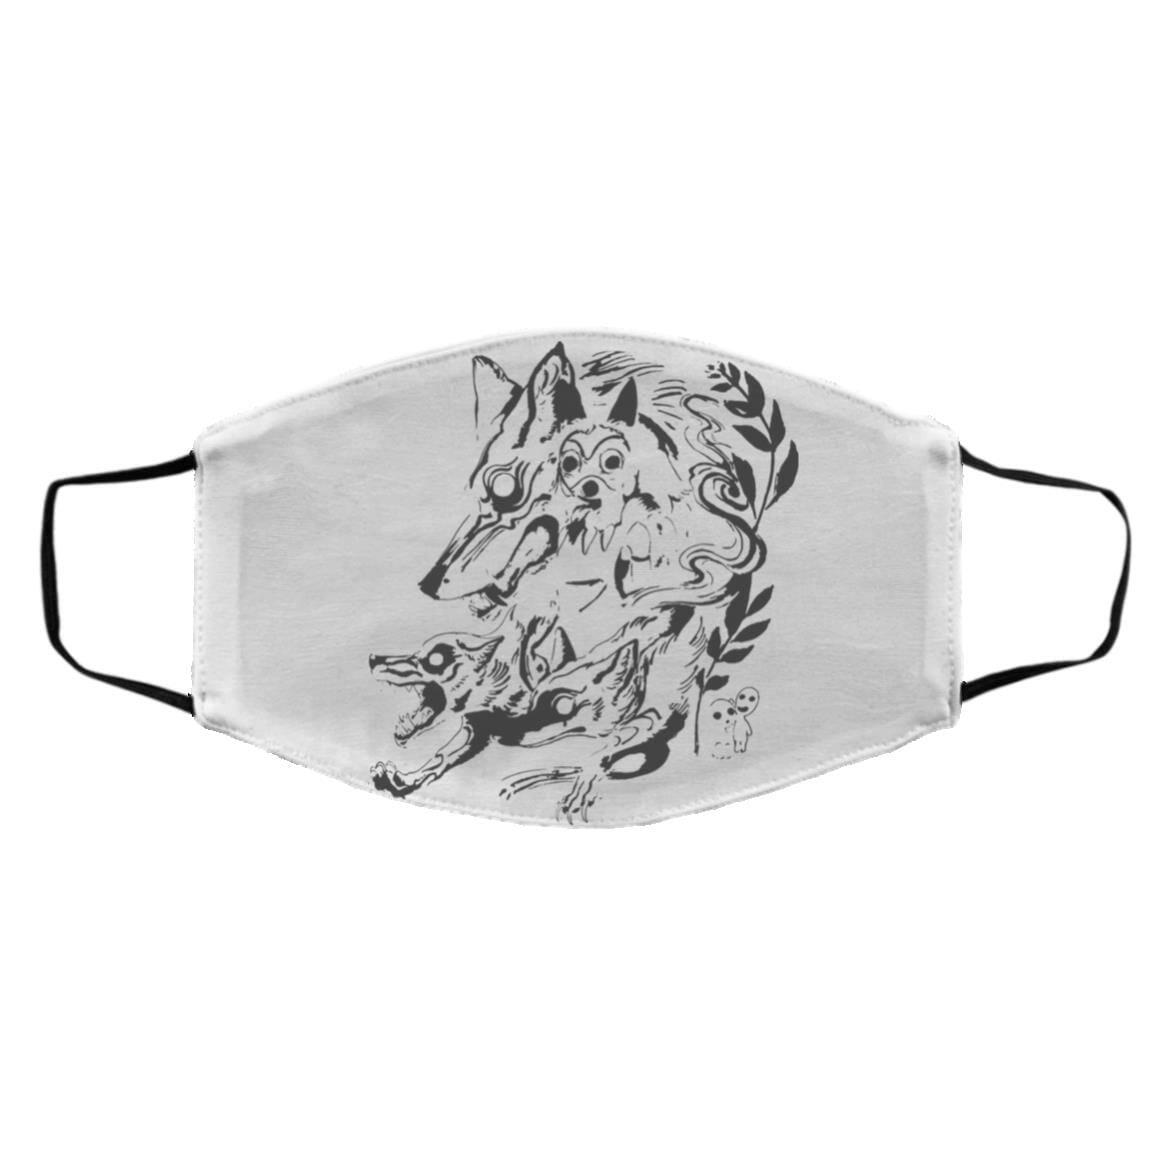 Princess Mononoke and The Wolf Creative Art Face Mask